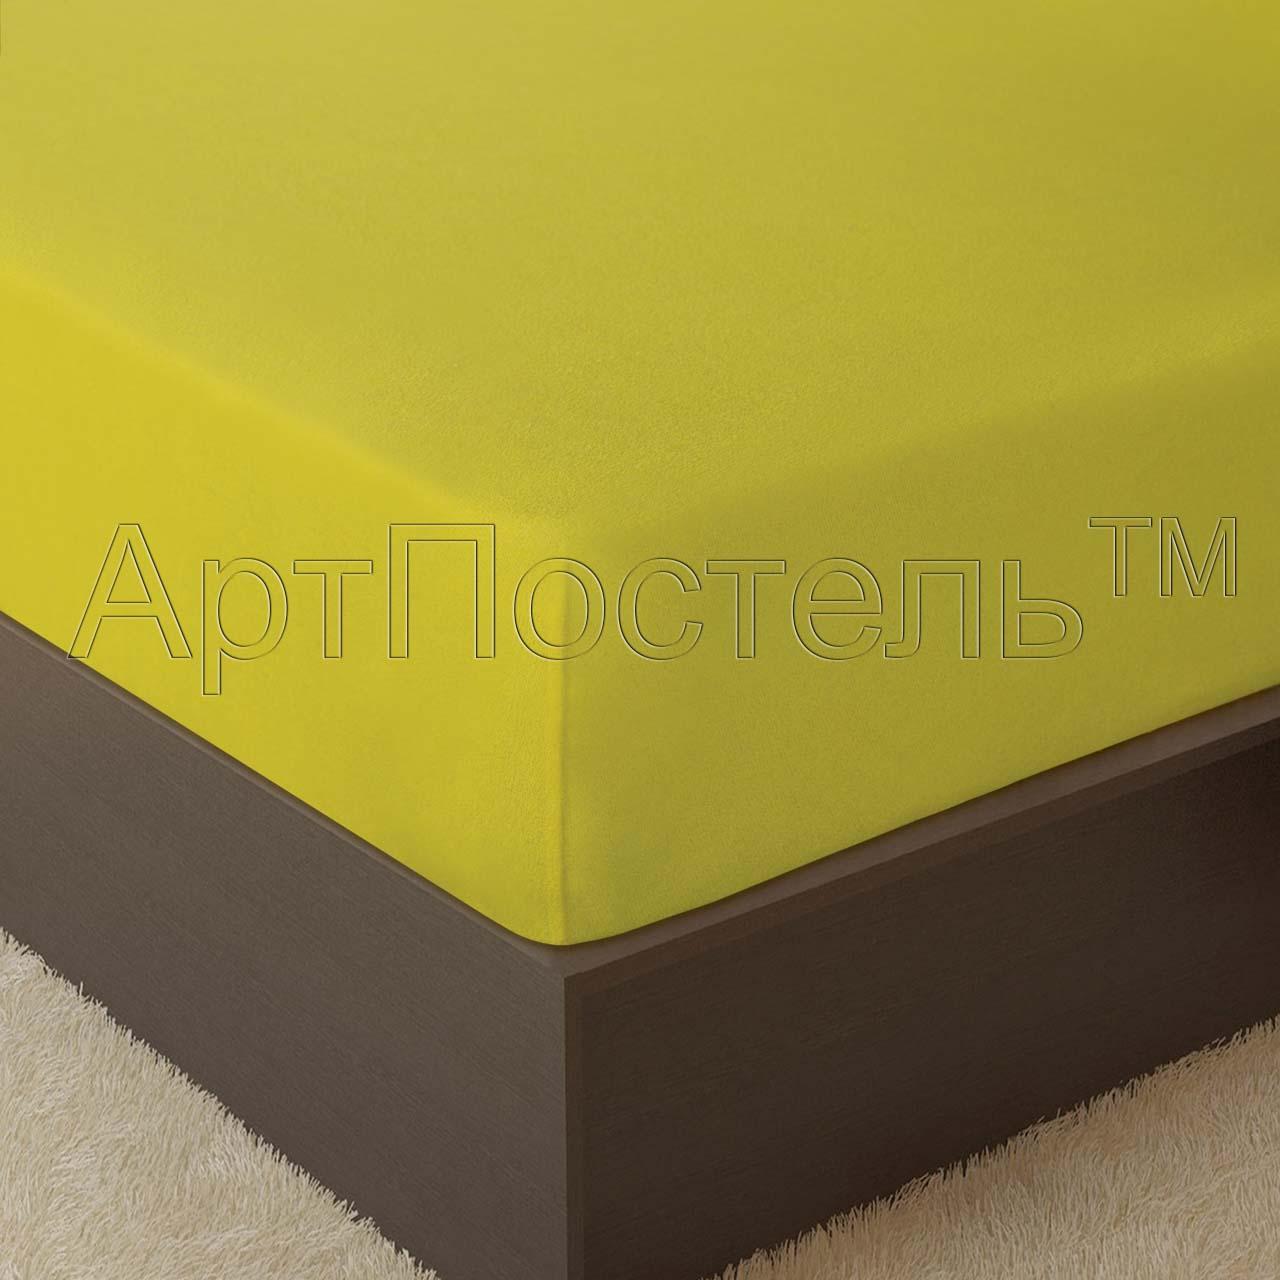 Простыня Лимон р. 120х200Простыни<br>Плотность: 160 г/кв. м <br>Высота матраса: 20 см<br><br>Тип: Простыня<br>Размер: 120х200<br>Материал: Махра